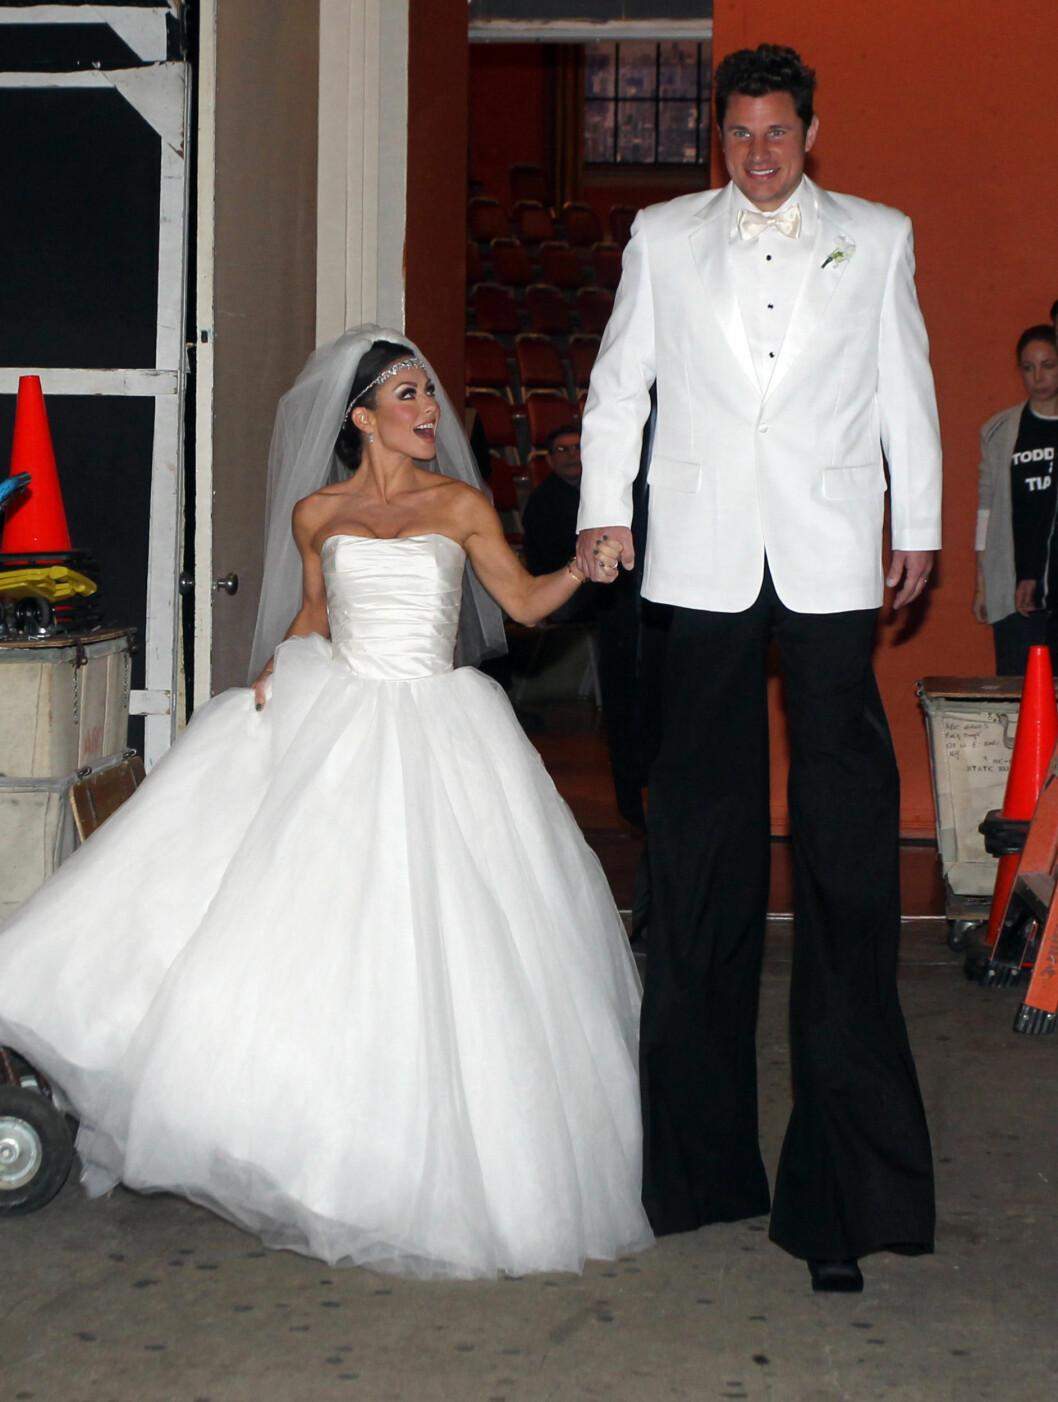 MORO: Programlederne Kelly Ripa og Nick Lachey hadde kledd seg ut som Kim Kardashian og Kris Humphries. Foto: Stella Pictures